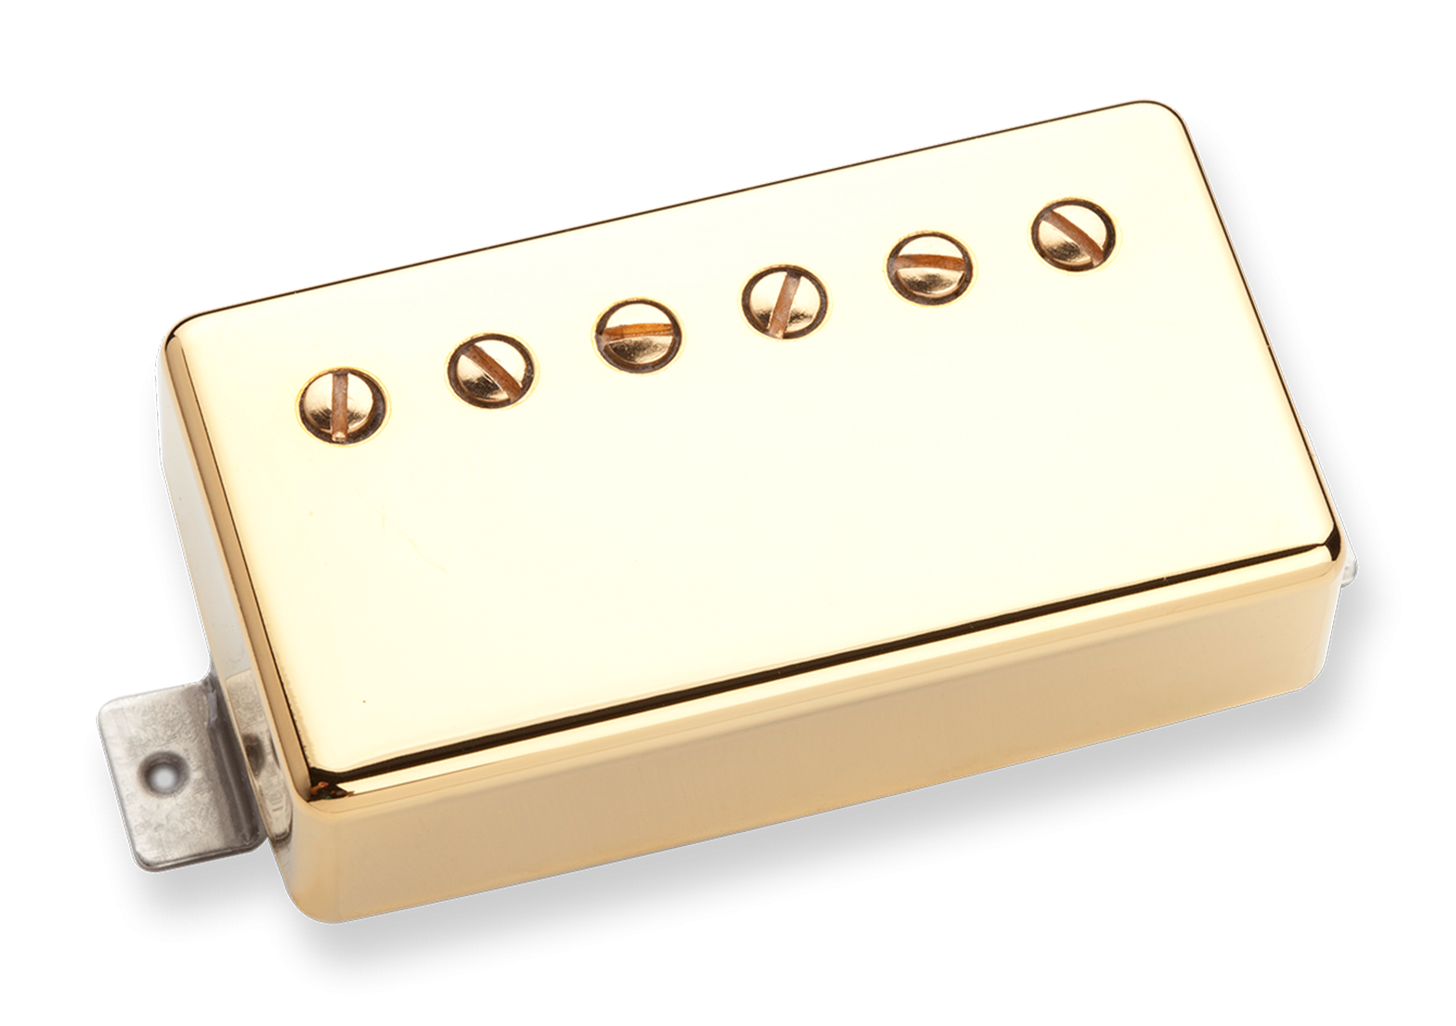 Seymour Duncan Seth Lover Humbucker - SH-55N Neck Gold